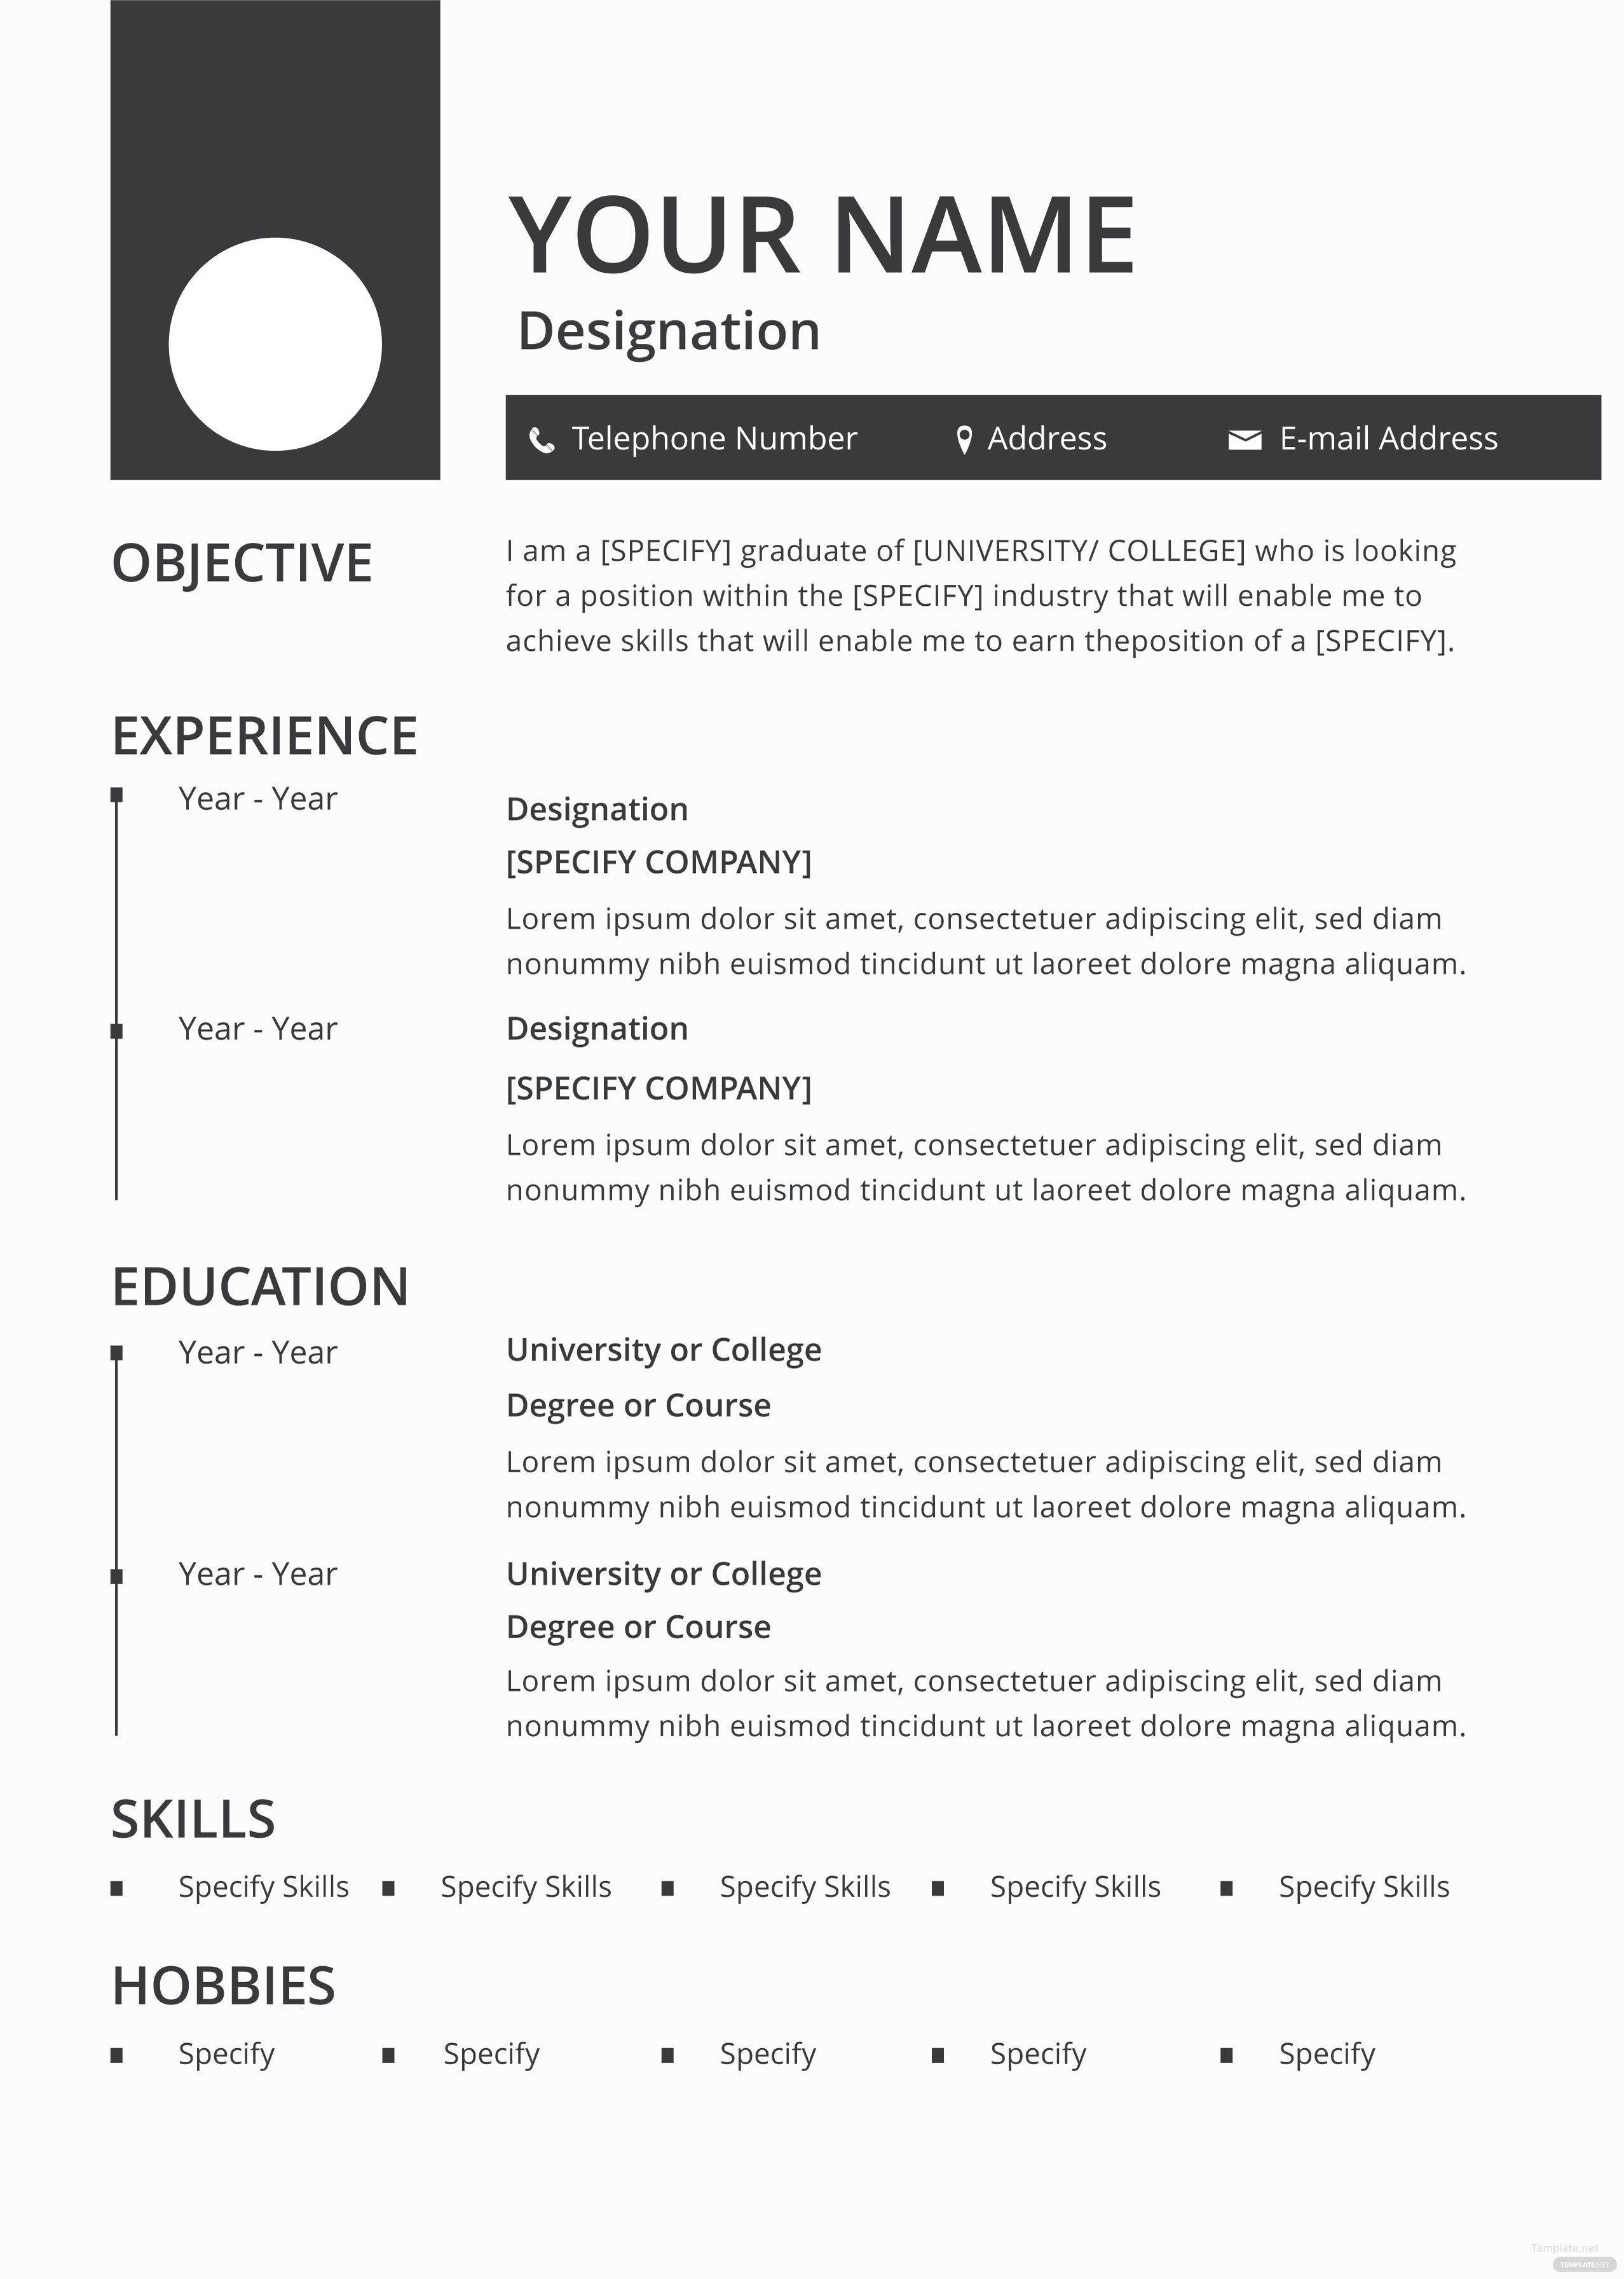 Resume Templates For Pages Fresh Free Blank Resume And Cv Template In Adobe Shop Of 32 Fantas Desain Cv Pendidikan Desain